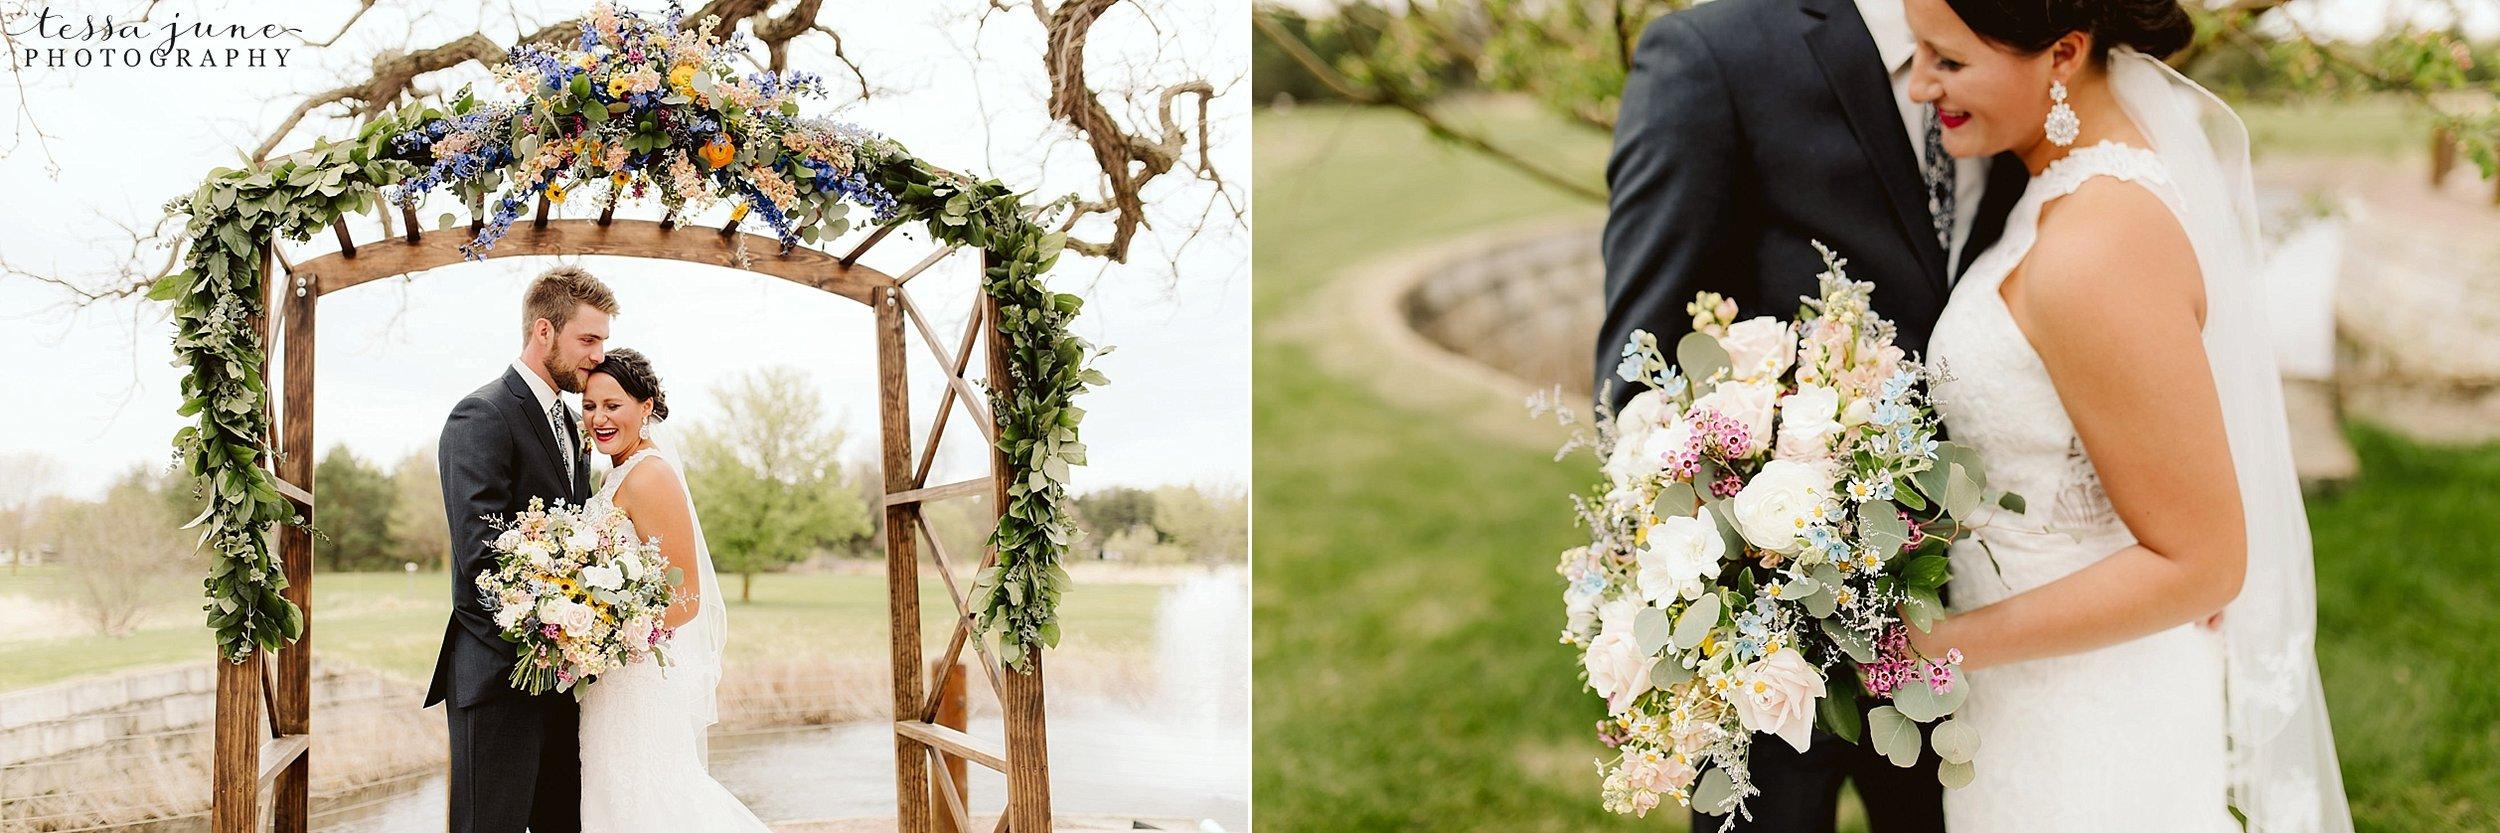 The-grands-at-mulligans-wedding-sartell-minnesota-spring-floral-spring-garden-wedding-49.jpg